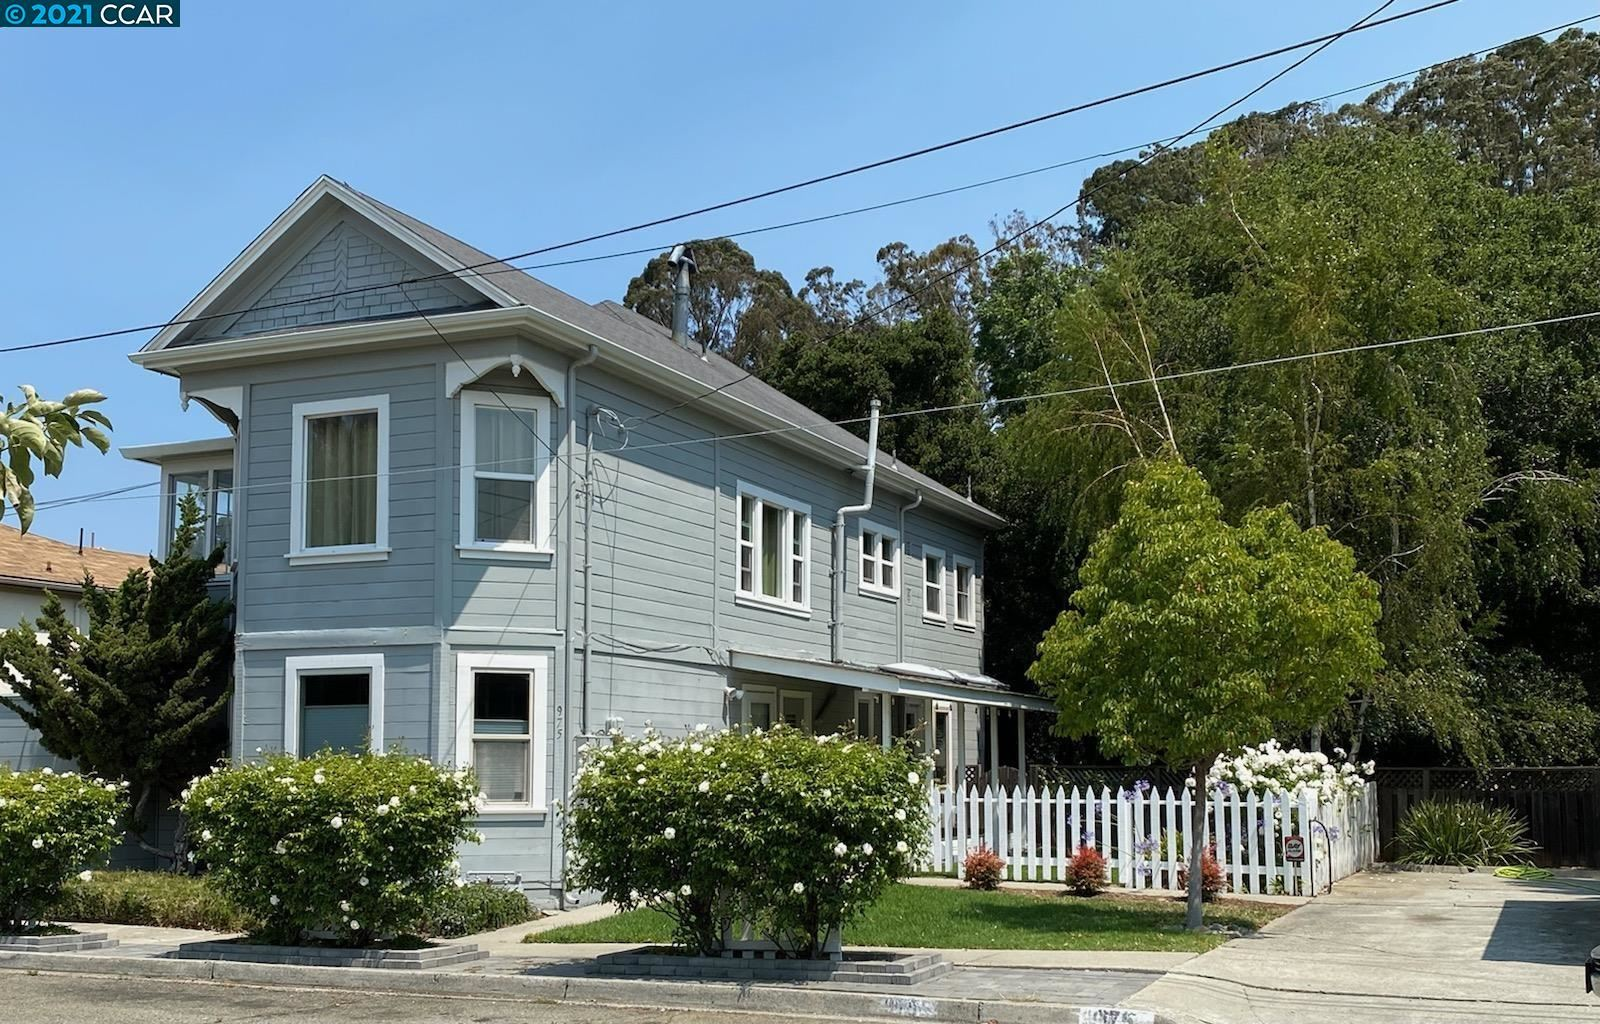 Photo of 973-75 Fernandez Ave, PINOLE, CA 94564 (MLS # 40967755)